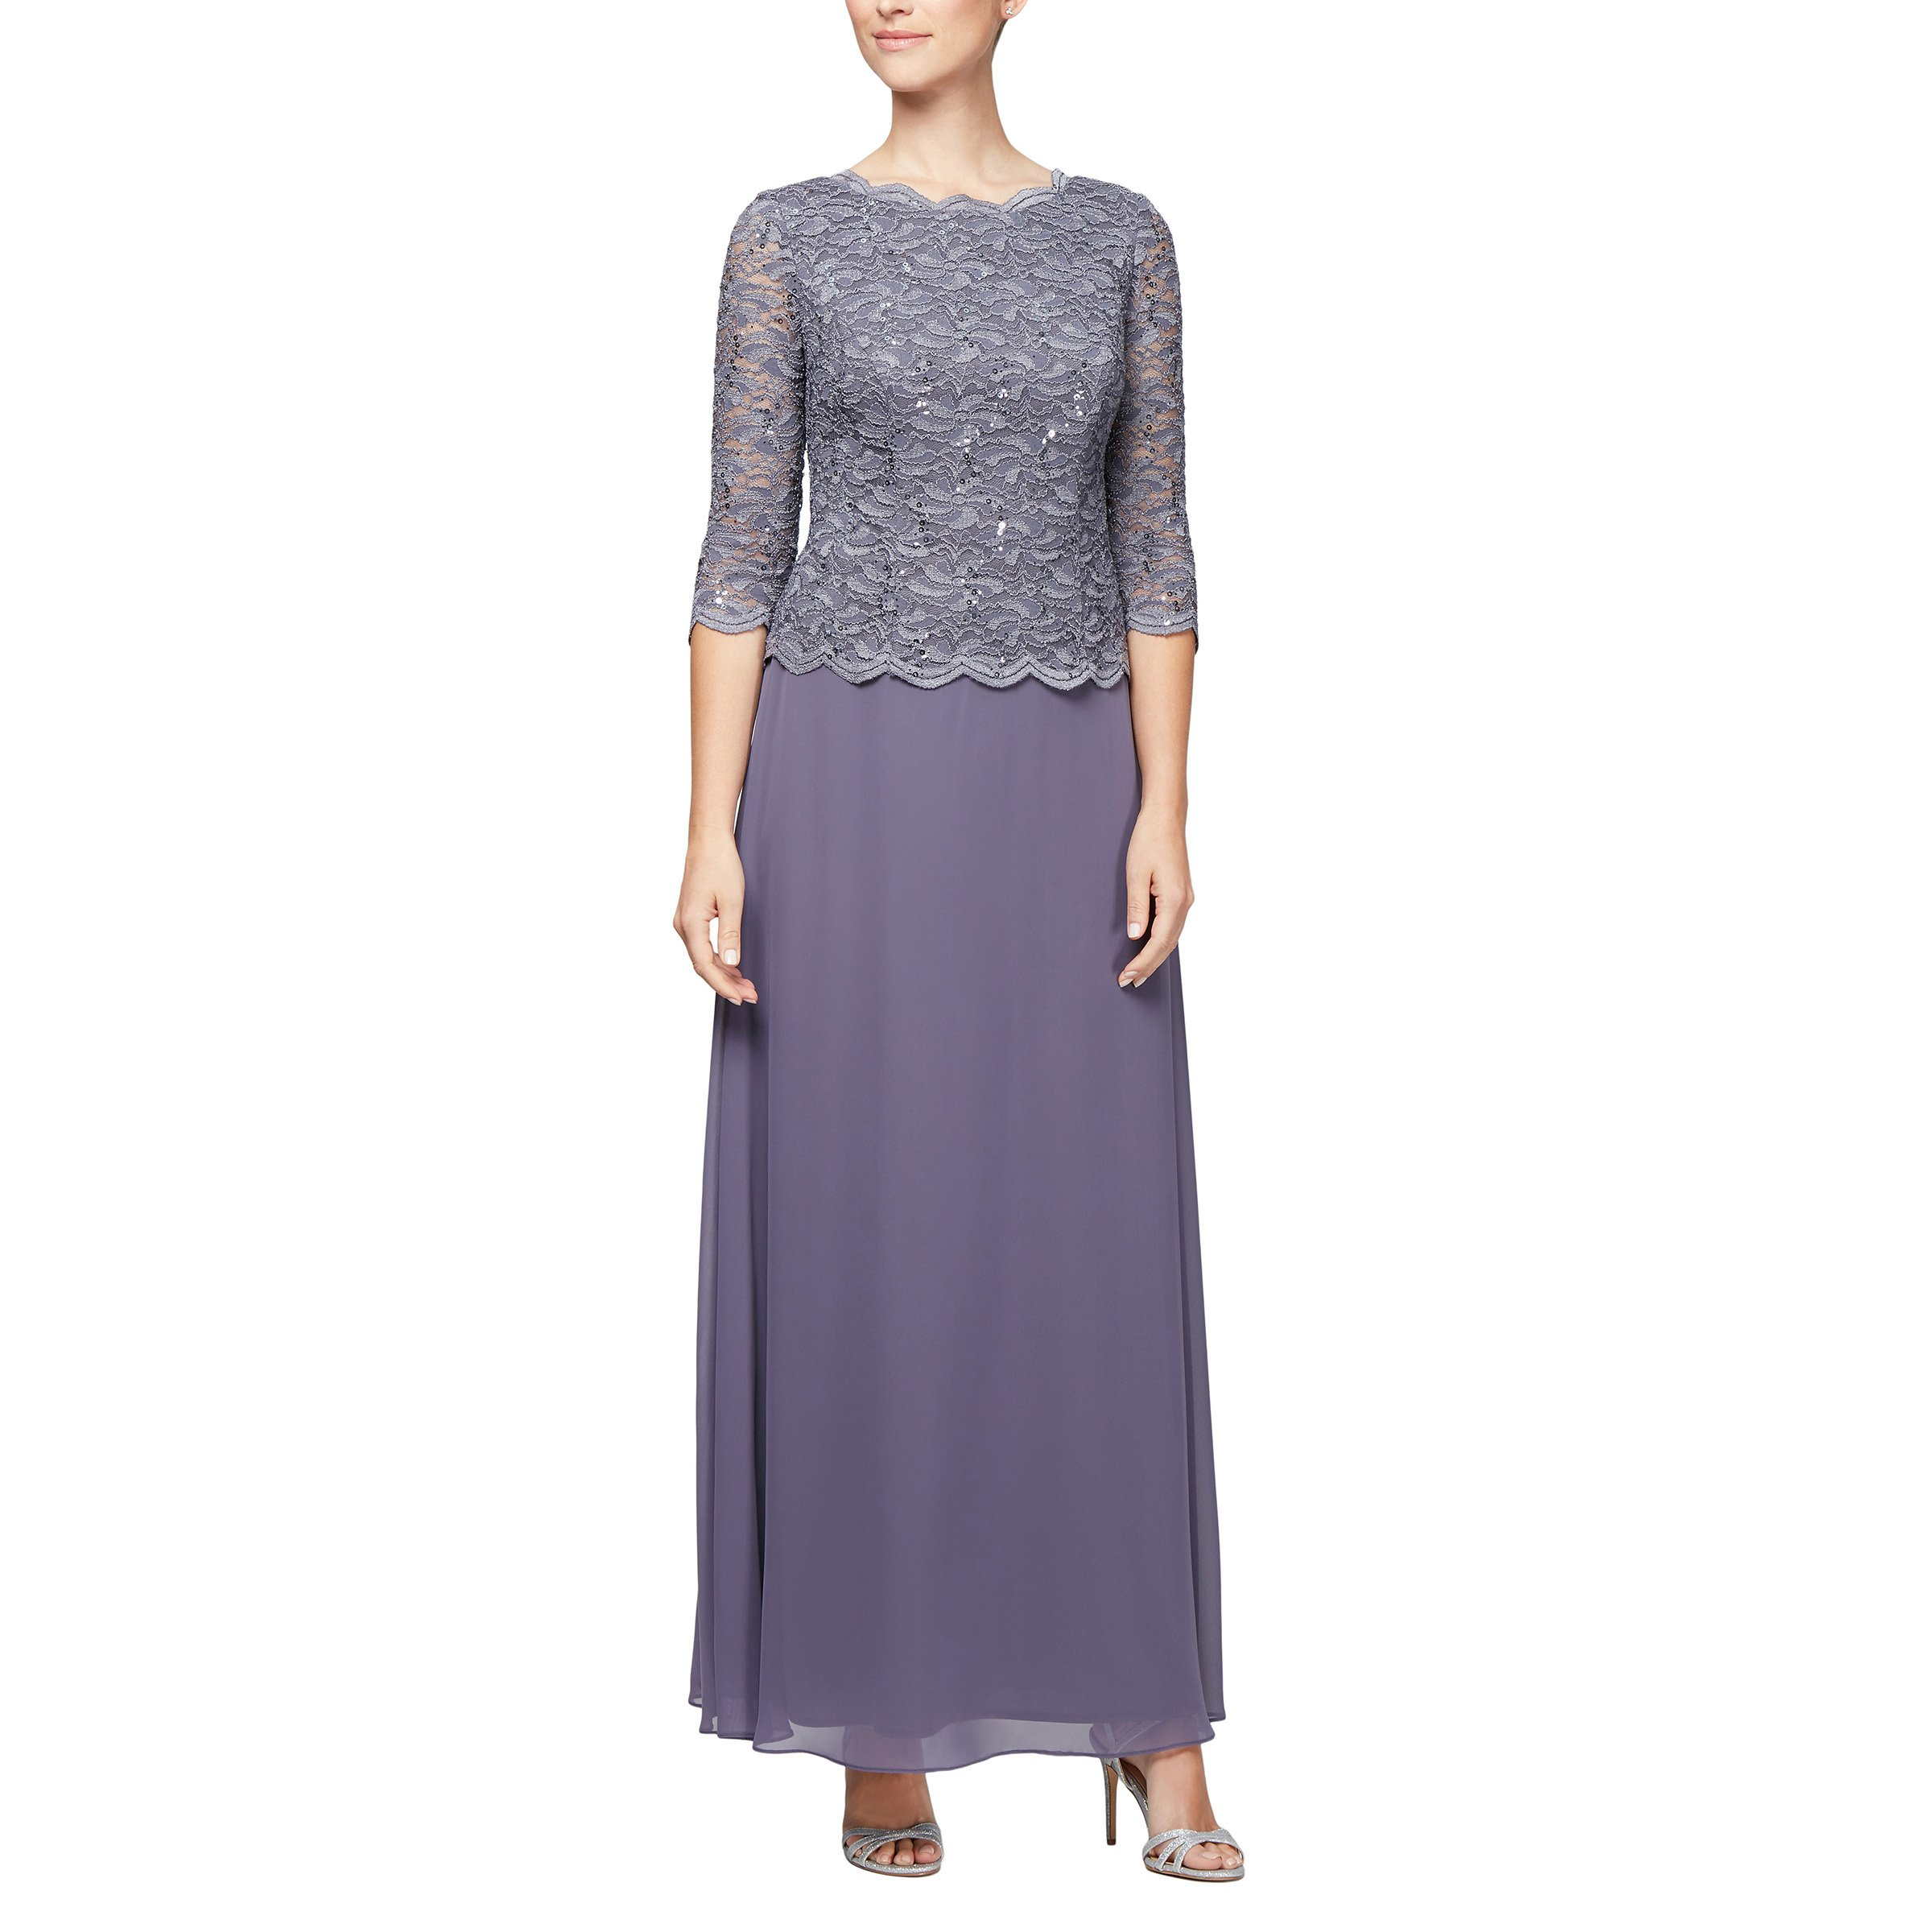 Dress Alex Evenings Womens Long Mock Dress with Full Skirt Petite and Regular Sizes